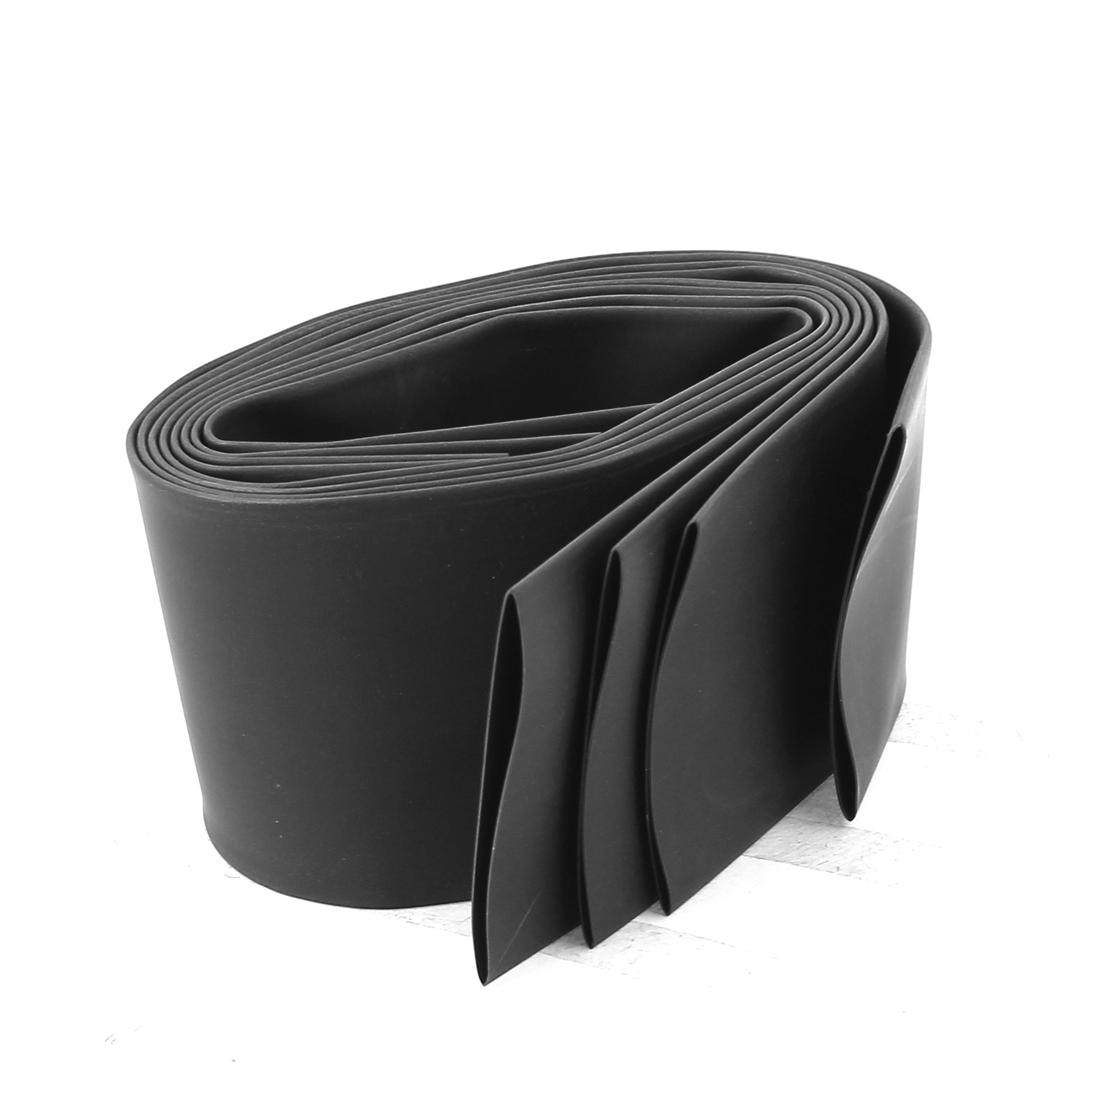 Ratio 2:1 35mm Dia Black Polyolefin Heat Shrinkable Tube 0.5M 4pcs